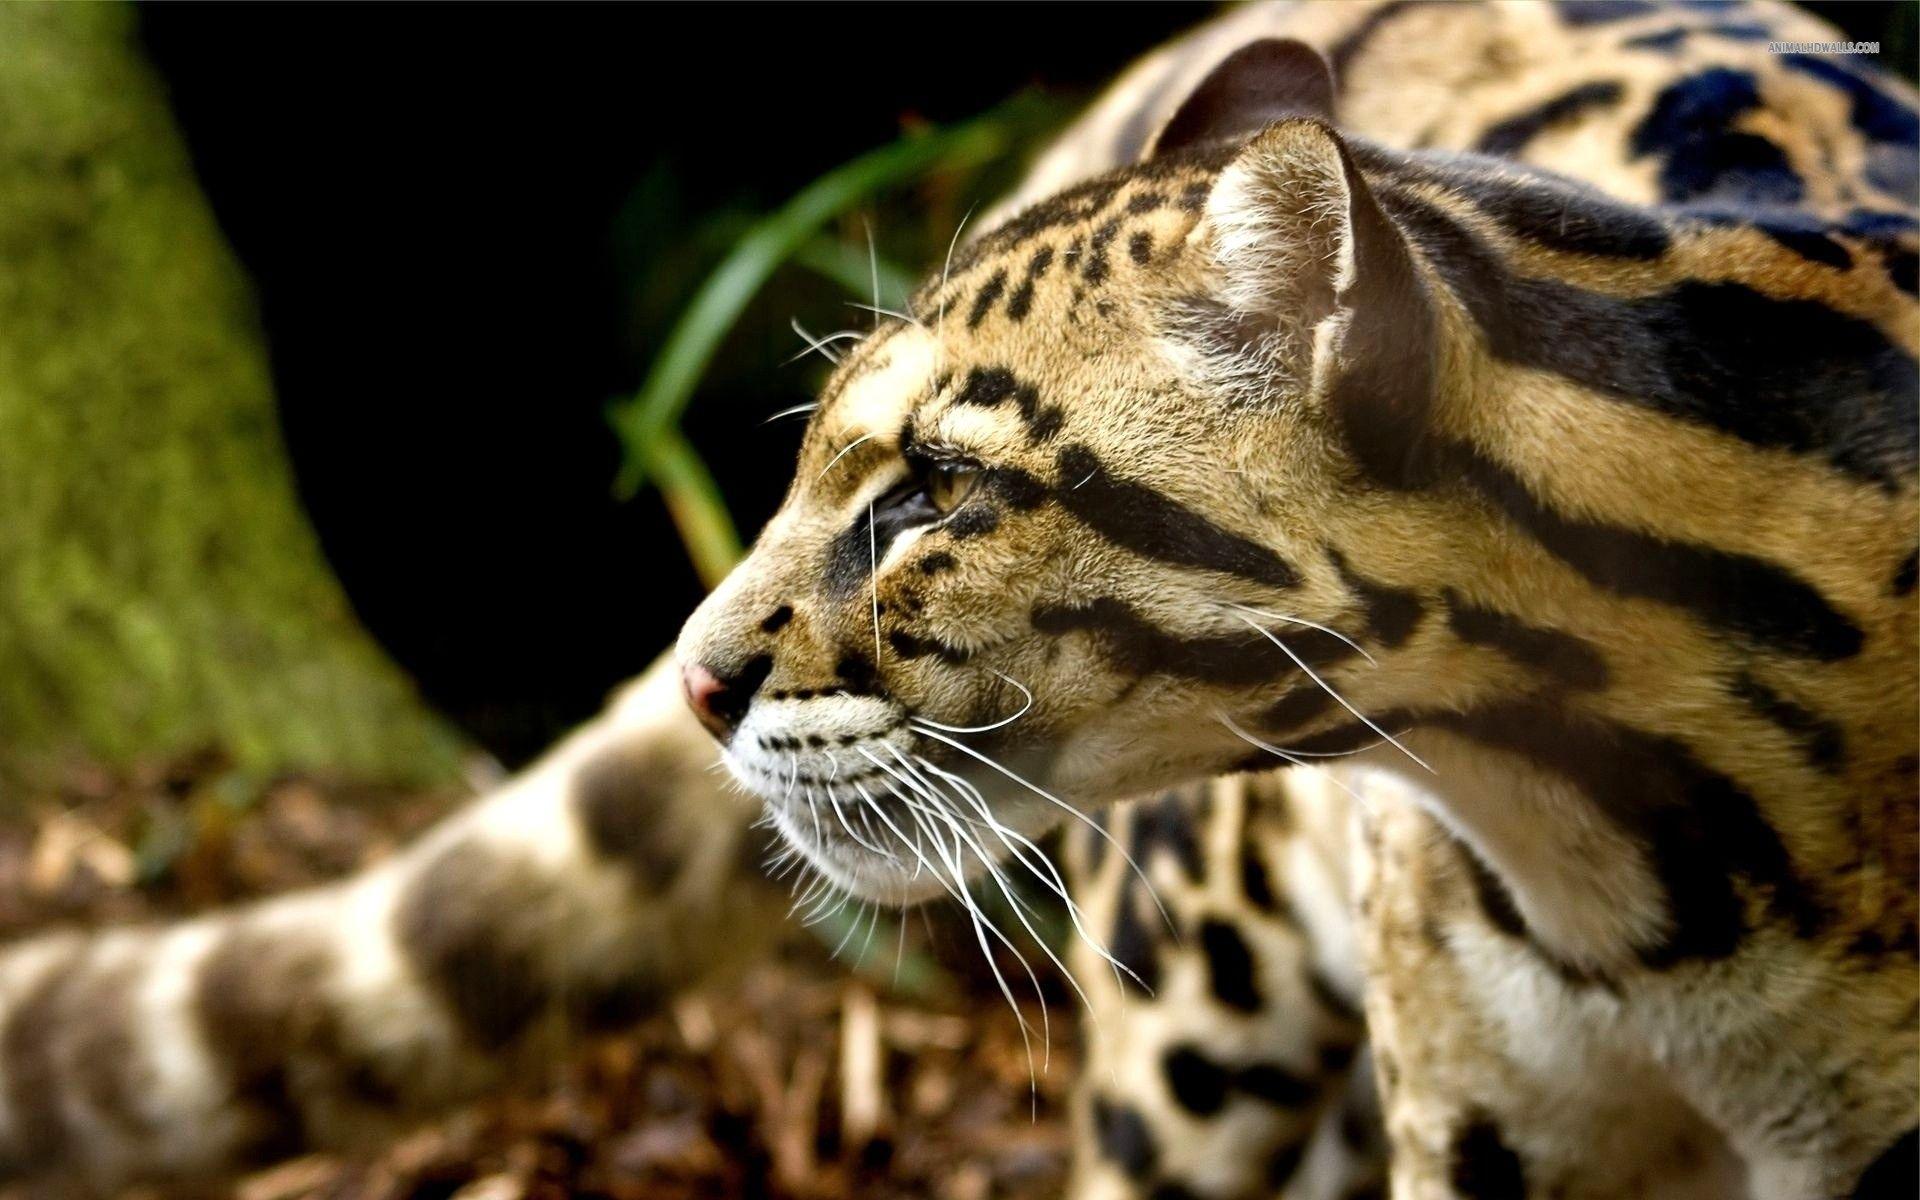 Ferocious Leopard Animals Teeth 853 1920X1200 (1920 1200) - Woodburning Pyrography And Designs 2 -